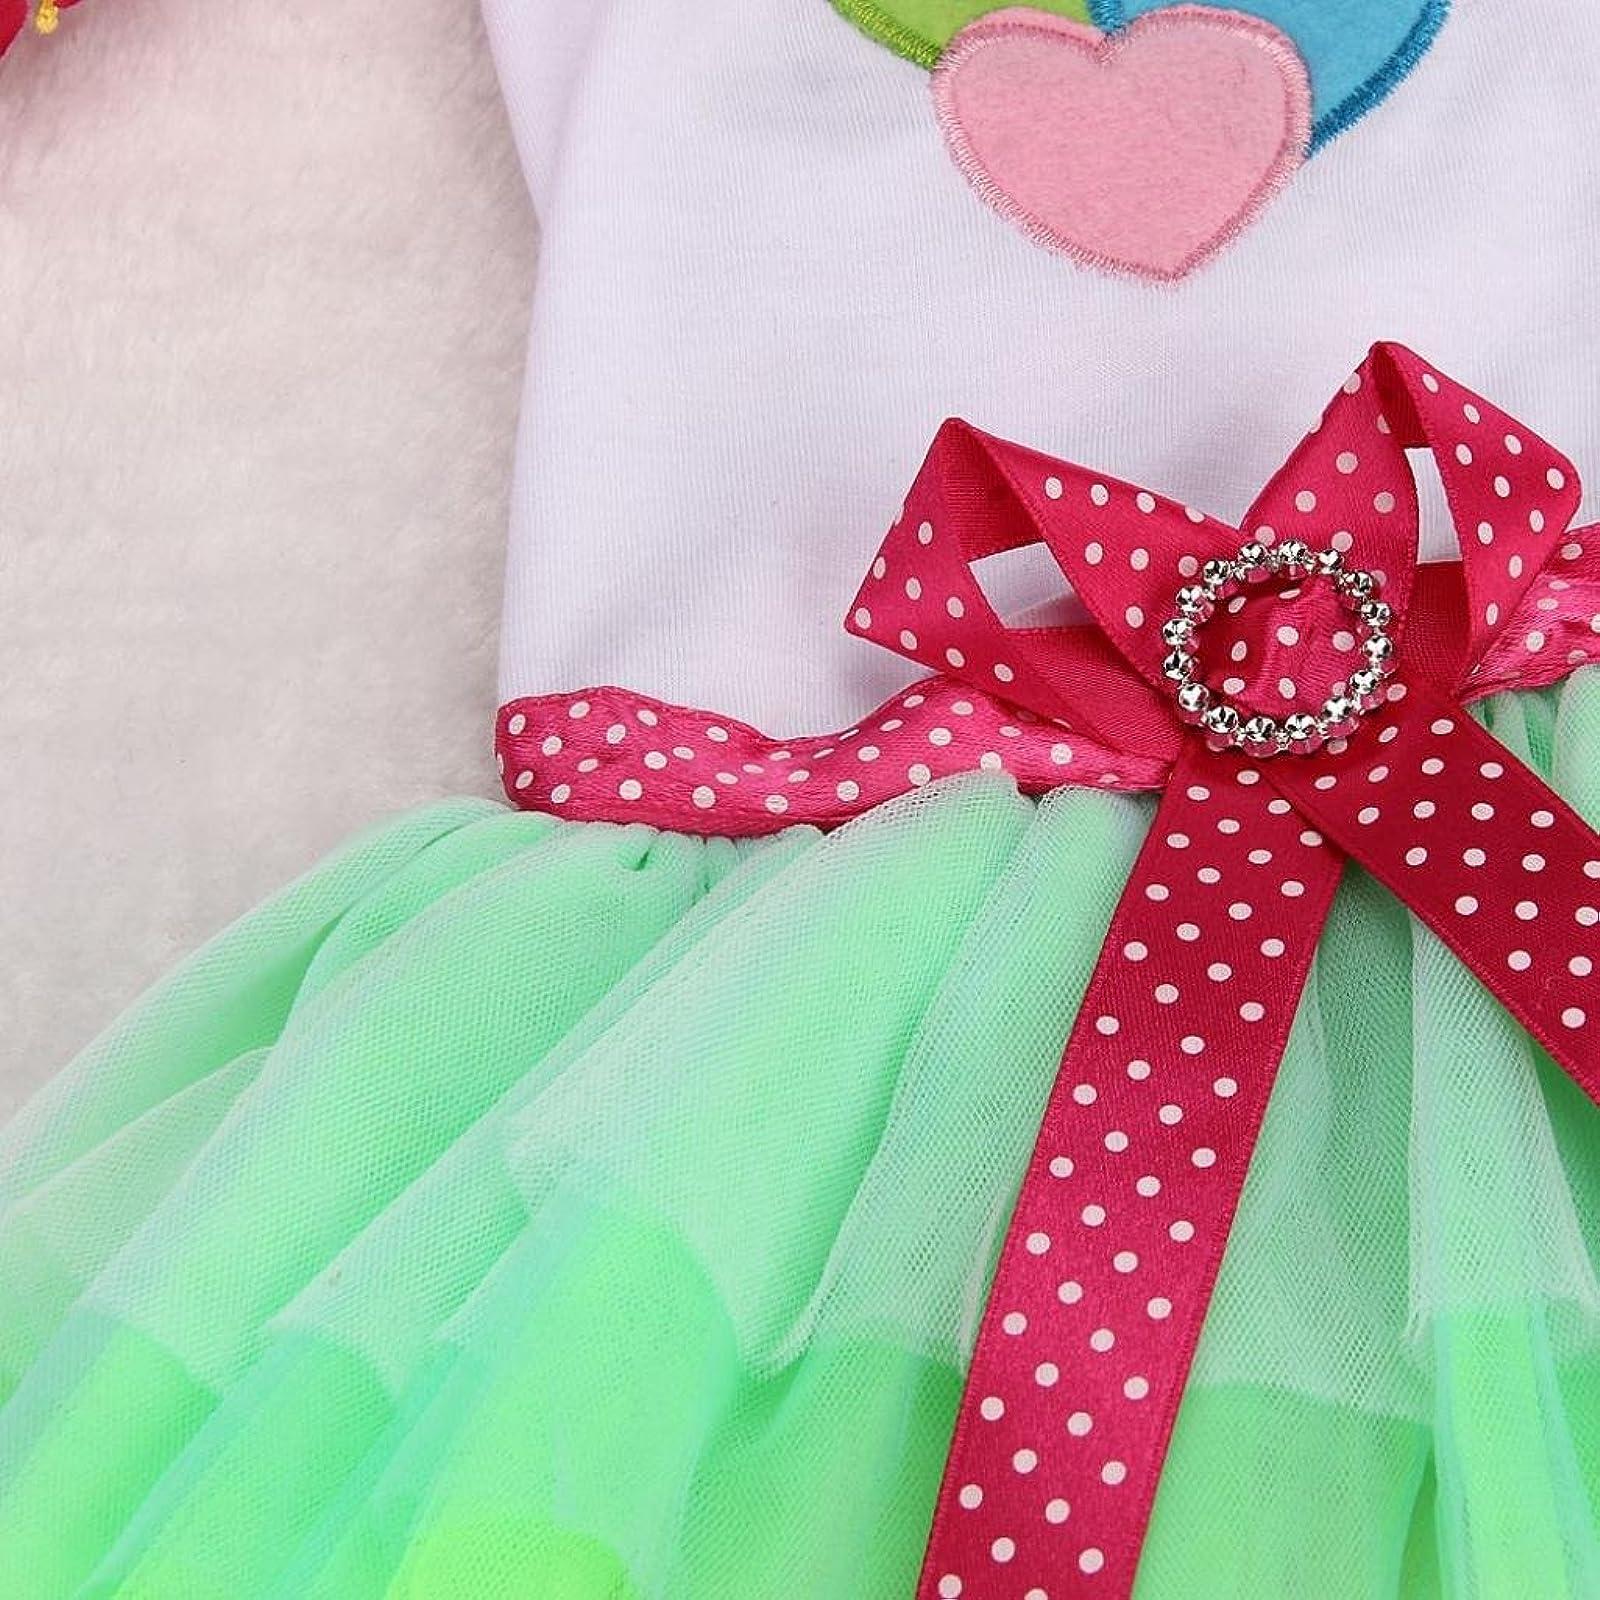 OutTop Girl Dog Dress Lace Princess Tutu WSM60224084S_YD - 3